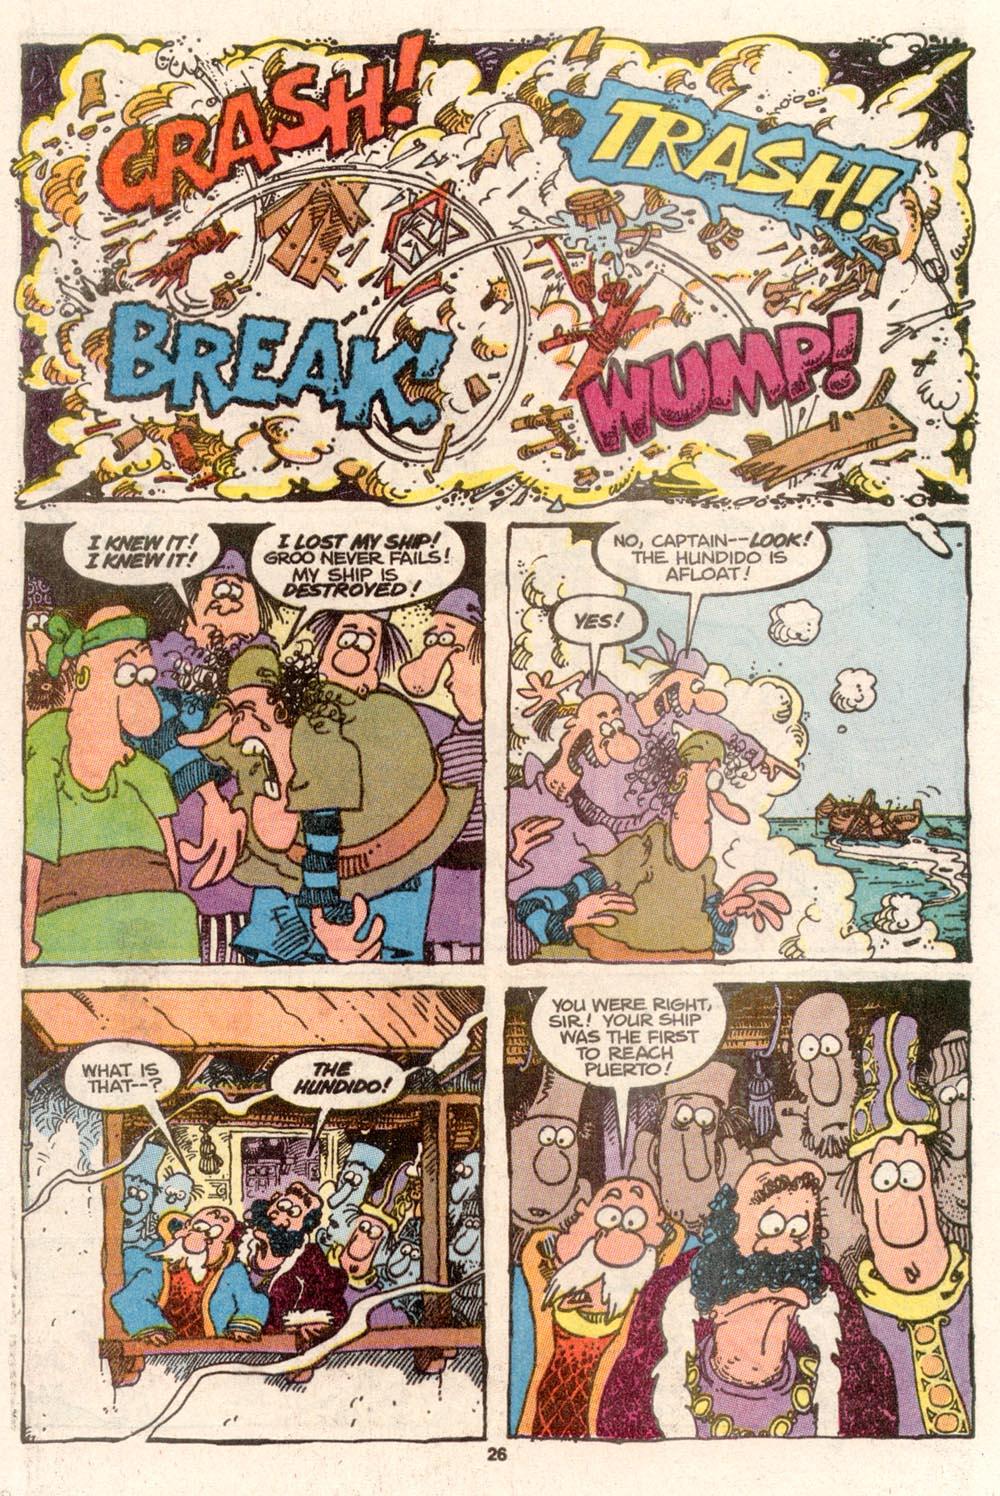 Read online Sergio Aragonés Groo the Wanderer comic -  Issue #69 - 21